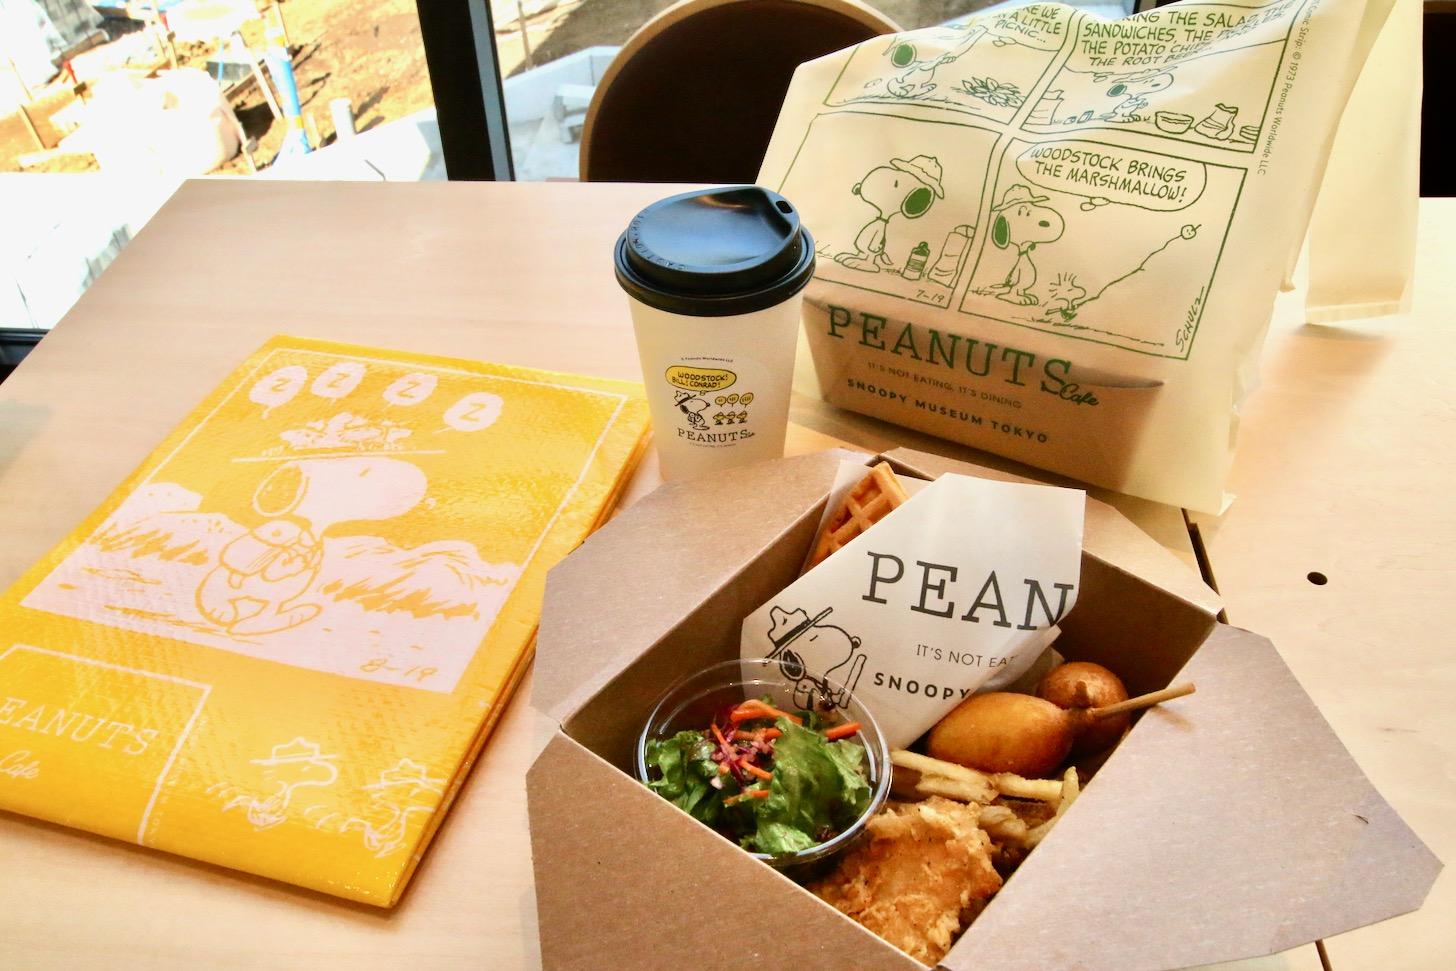 PEANUTS Cafe スヌーピーミュージアム ピーナッツ・ギャング ピクニックボックス